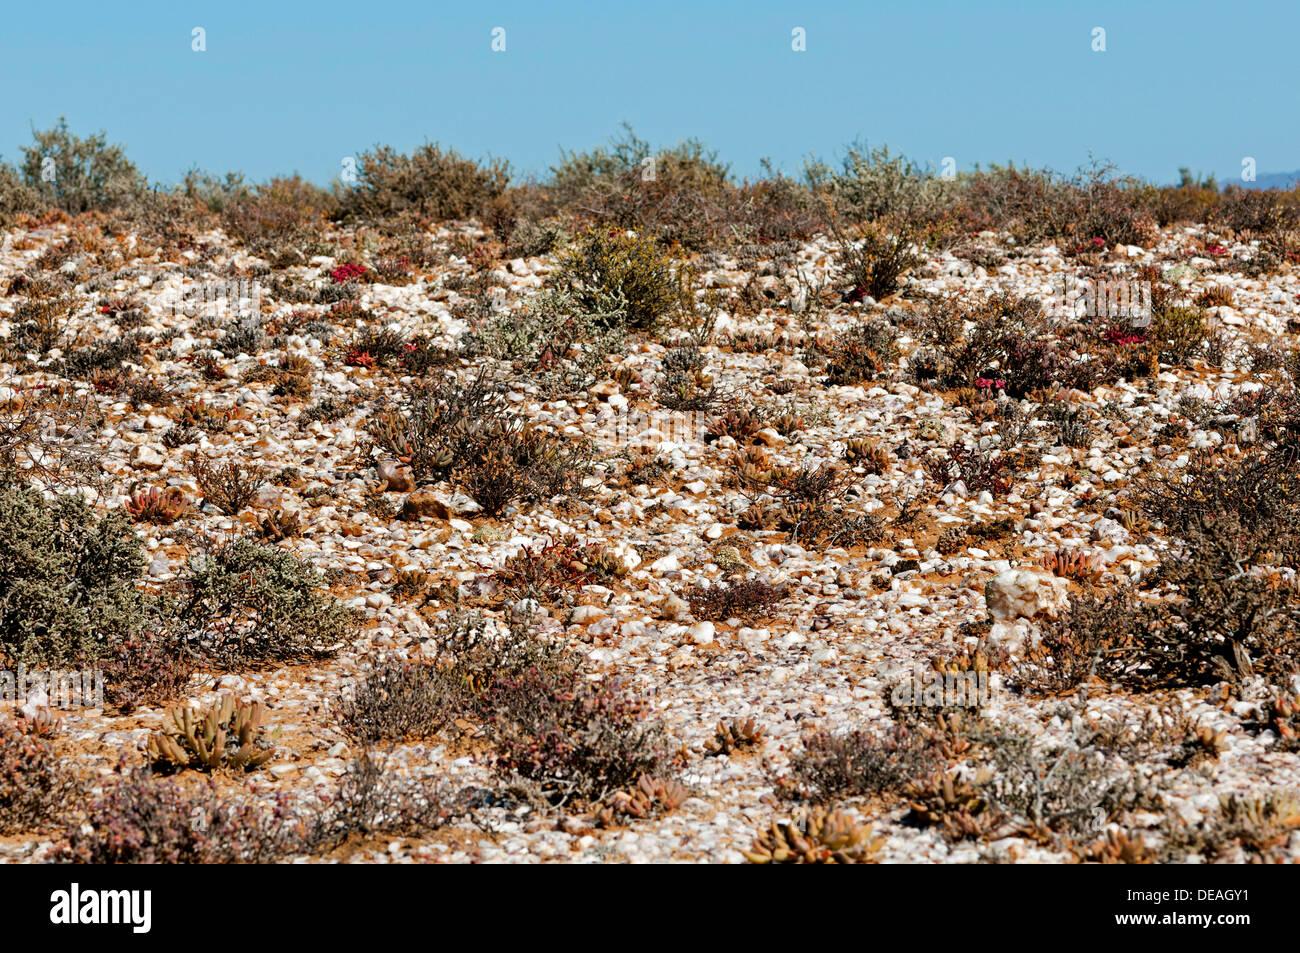 Quartz pebble field, Knersvlakte, near Vanrhynsdorp, Knersvlakte, South Africa - Stock Image